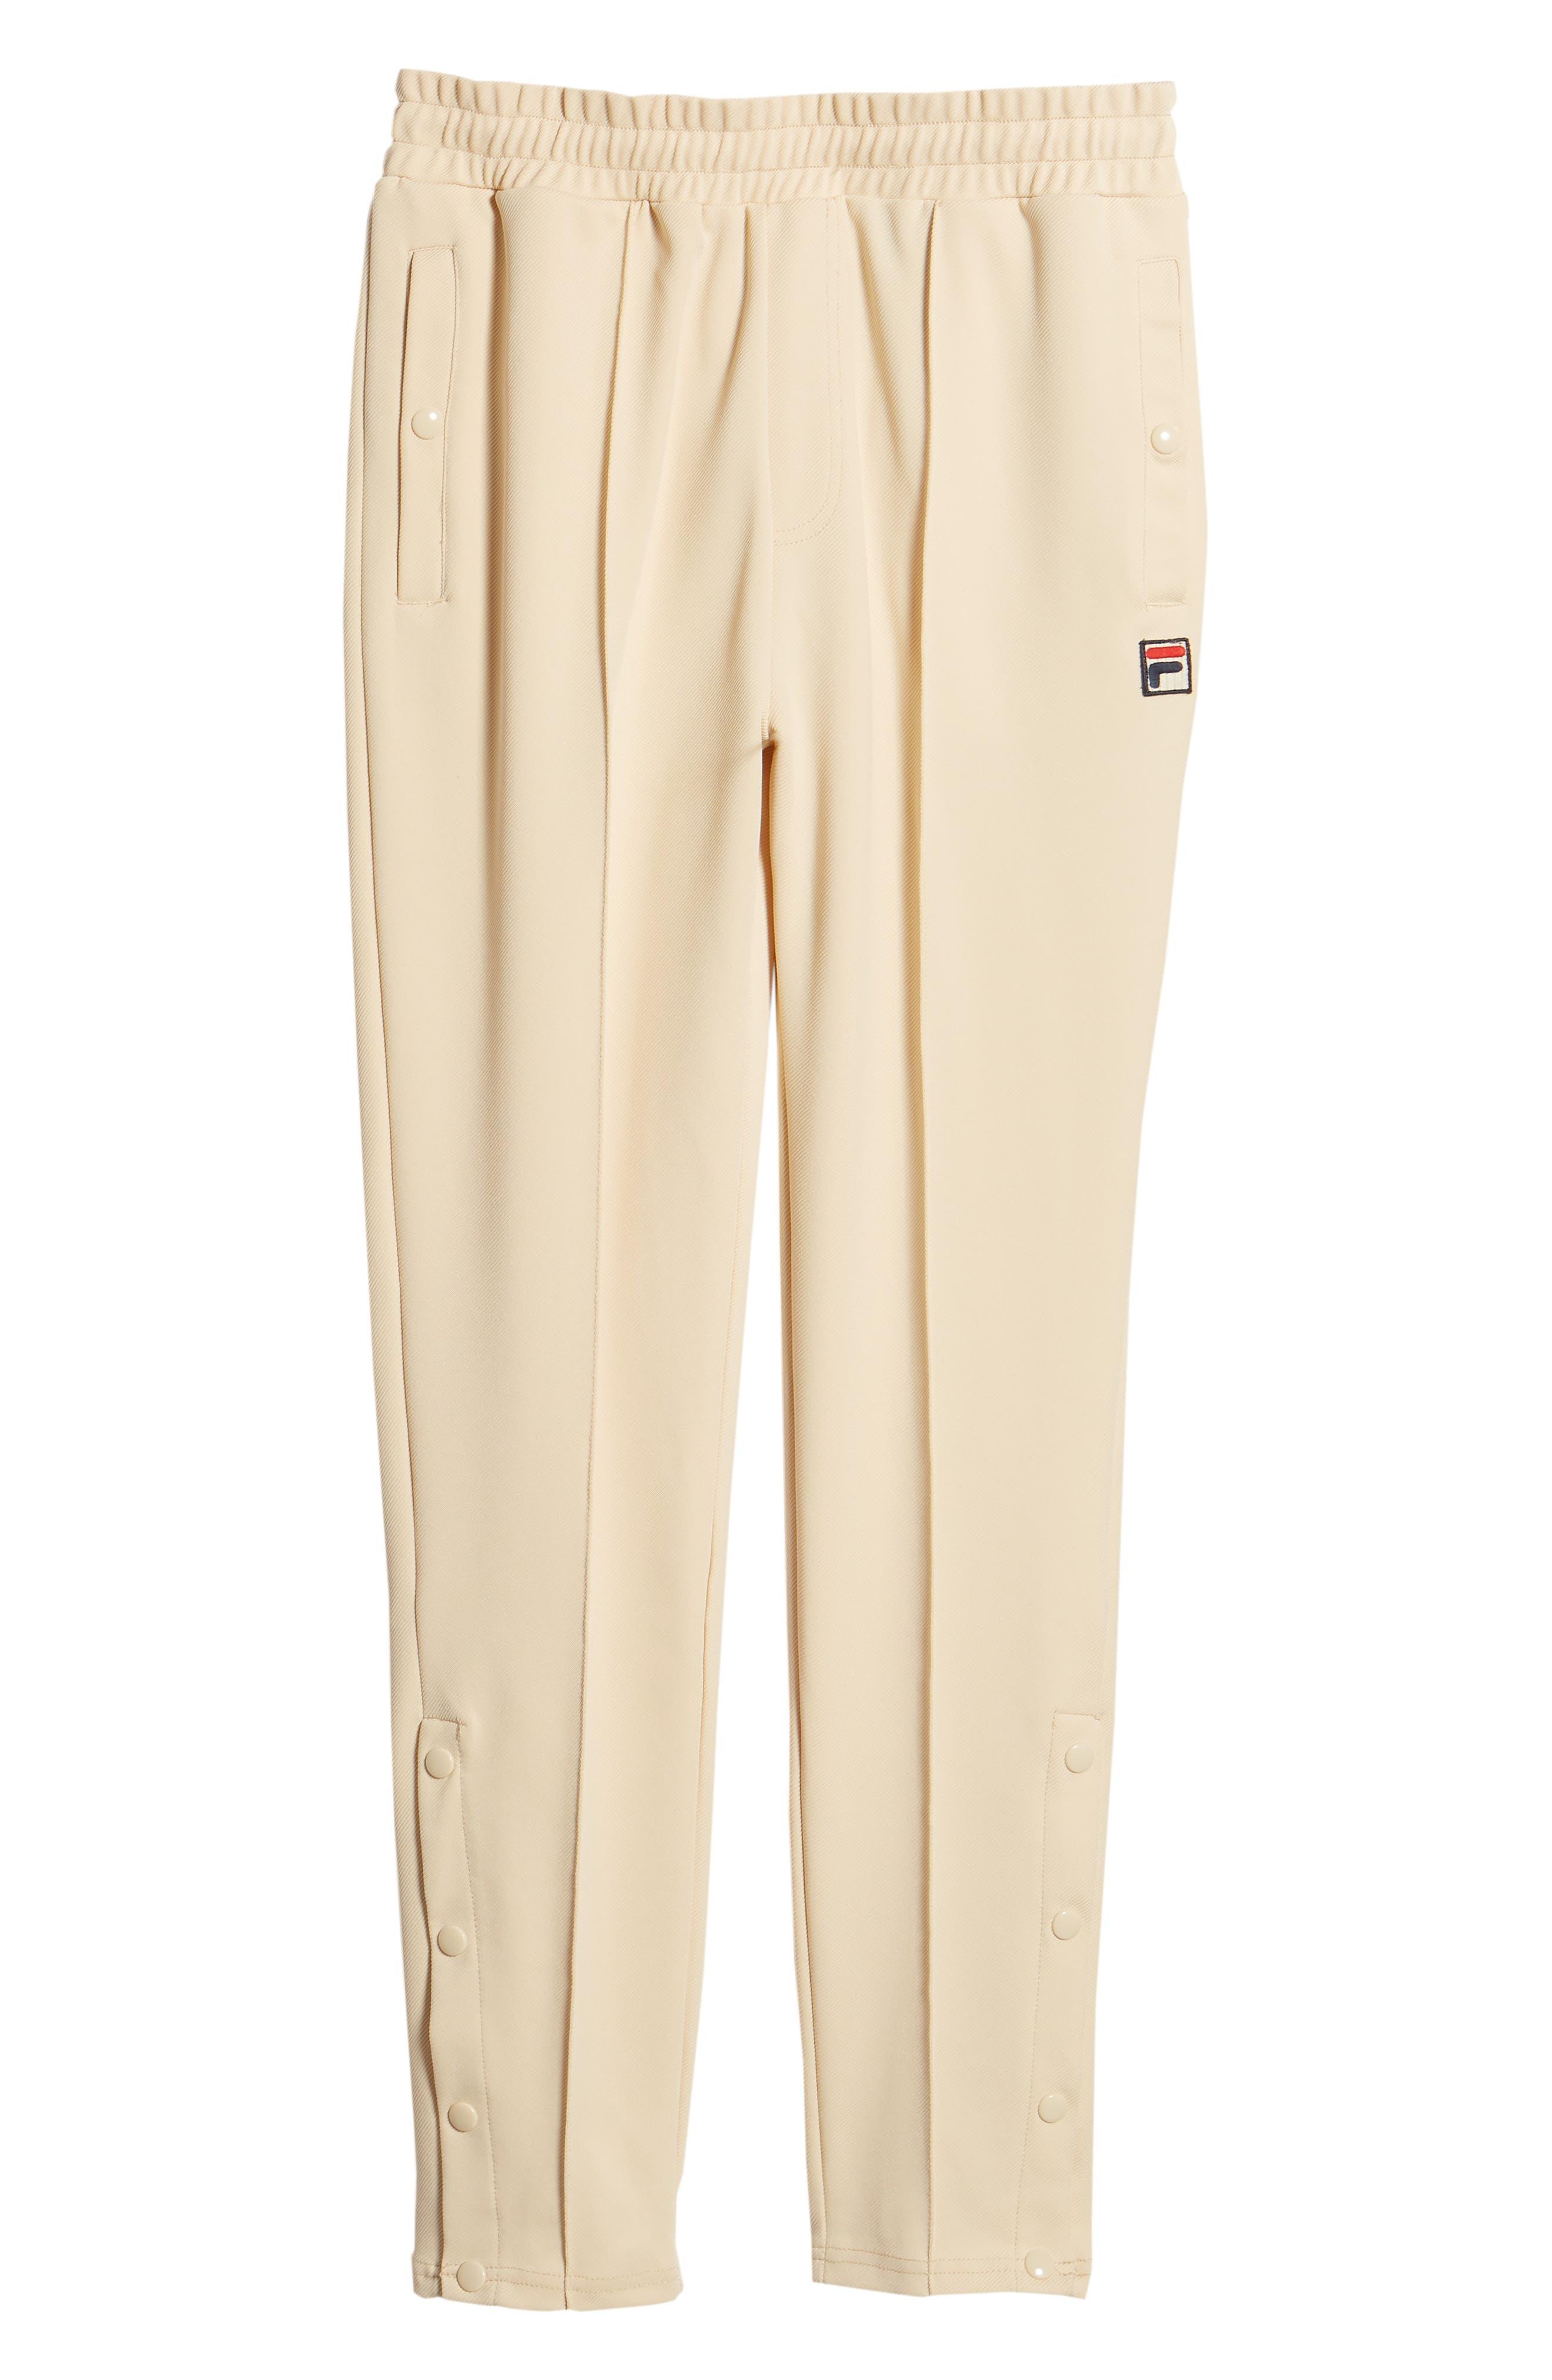 Molveno 2 Pants,                             Alternate thumbnail 6, color,                             250